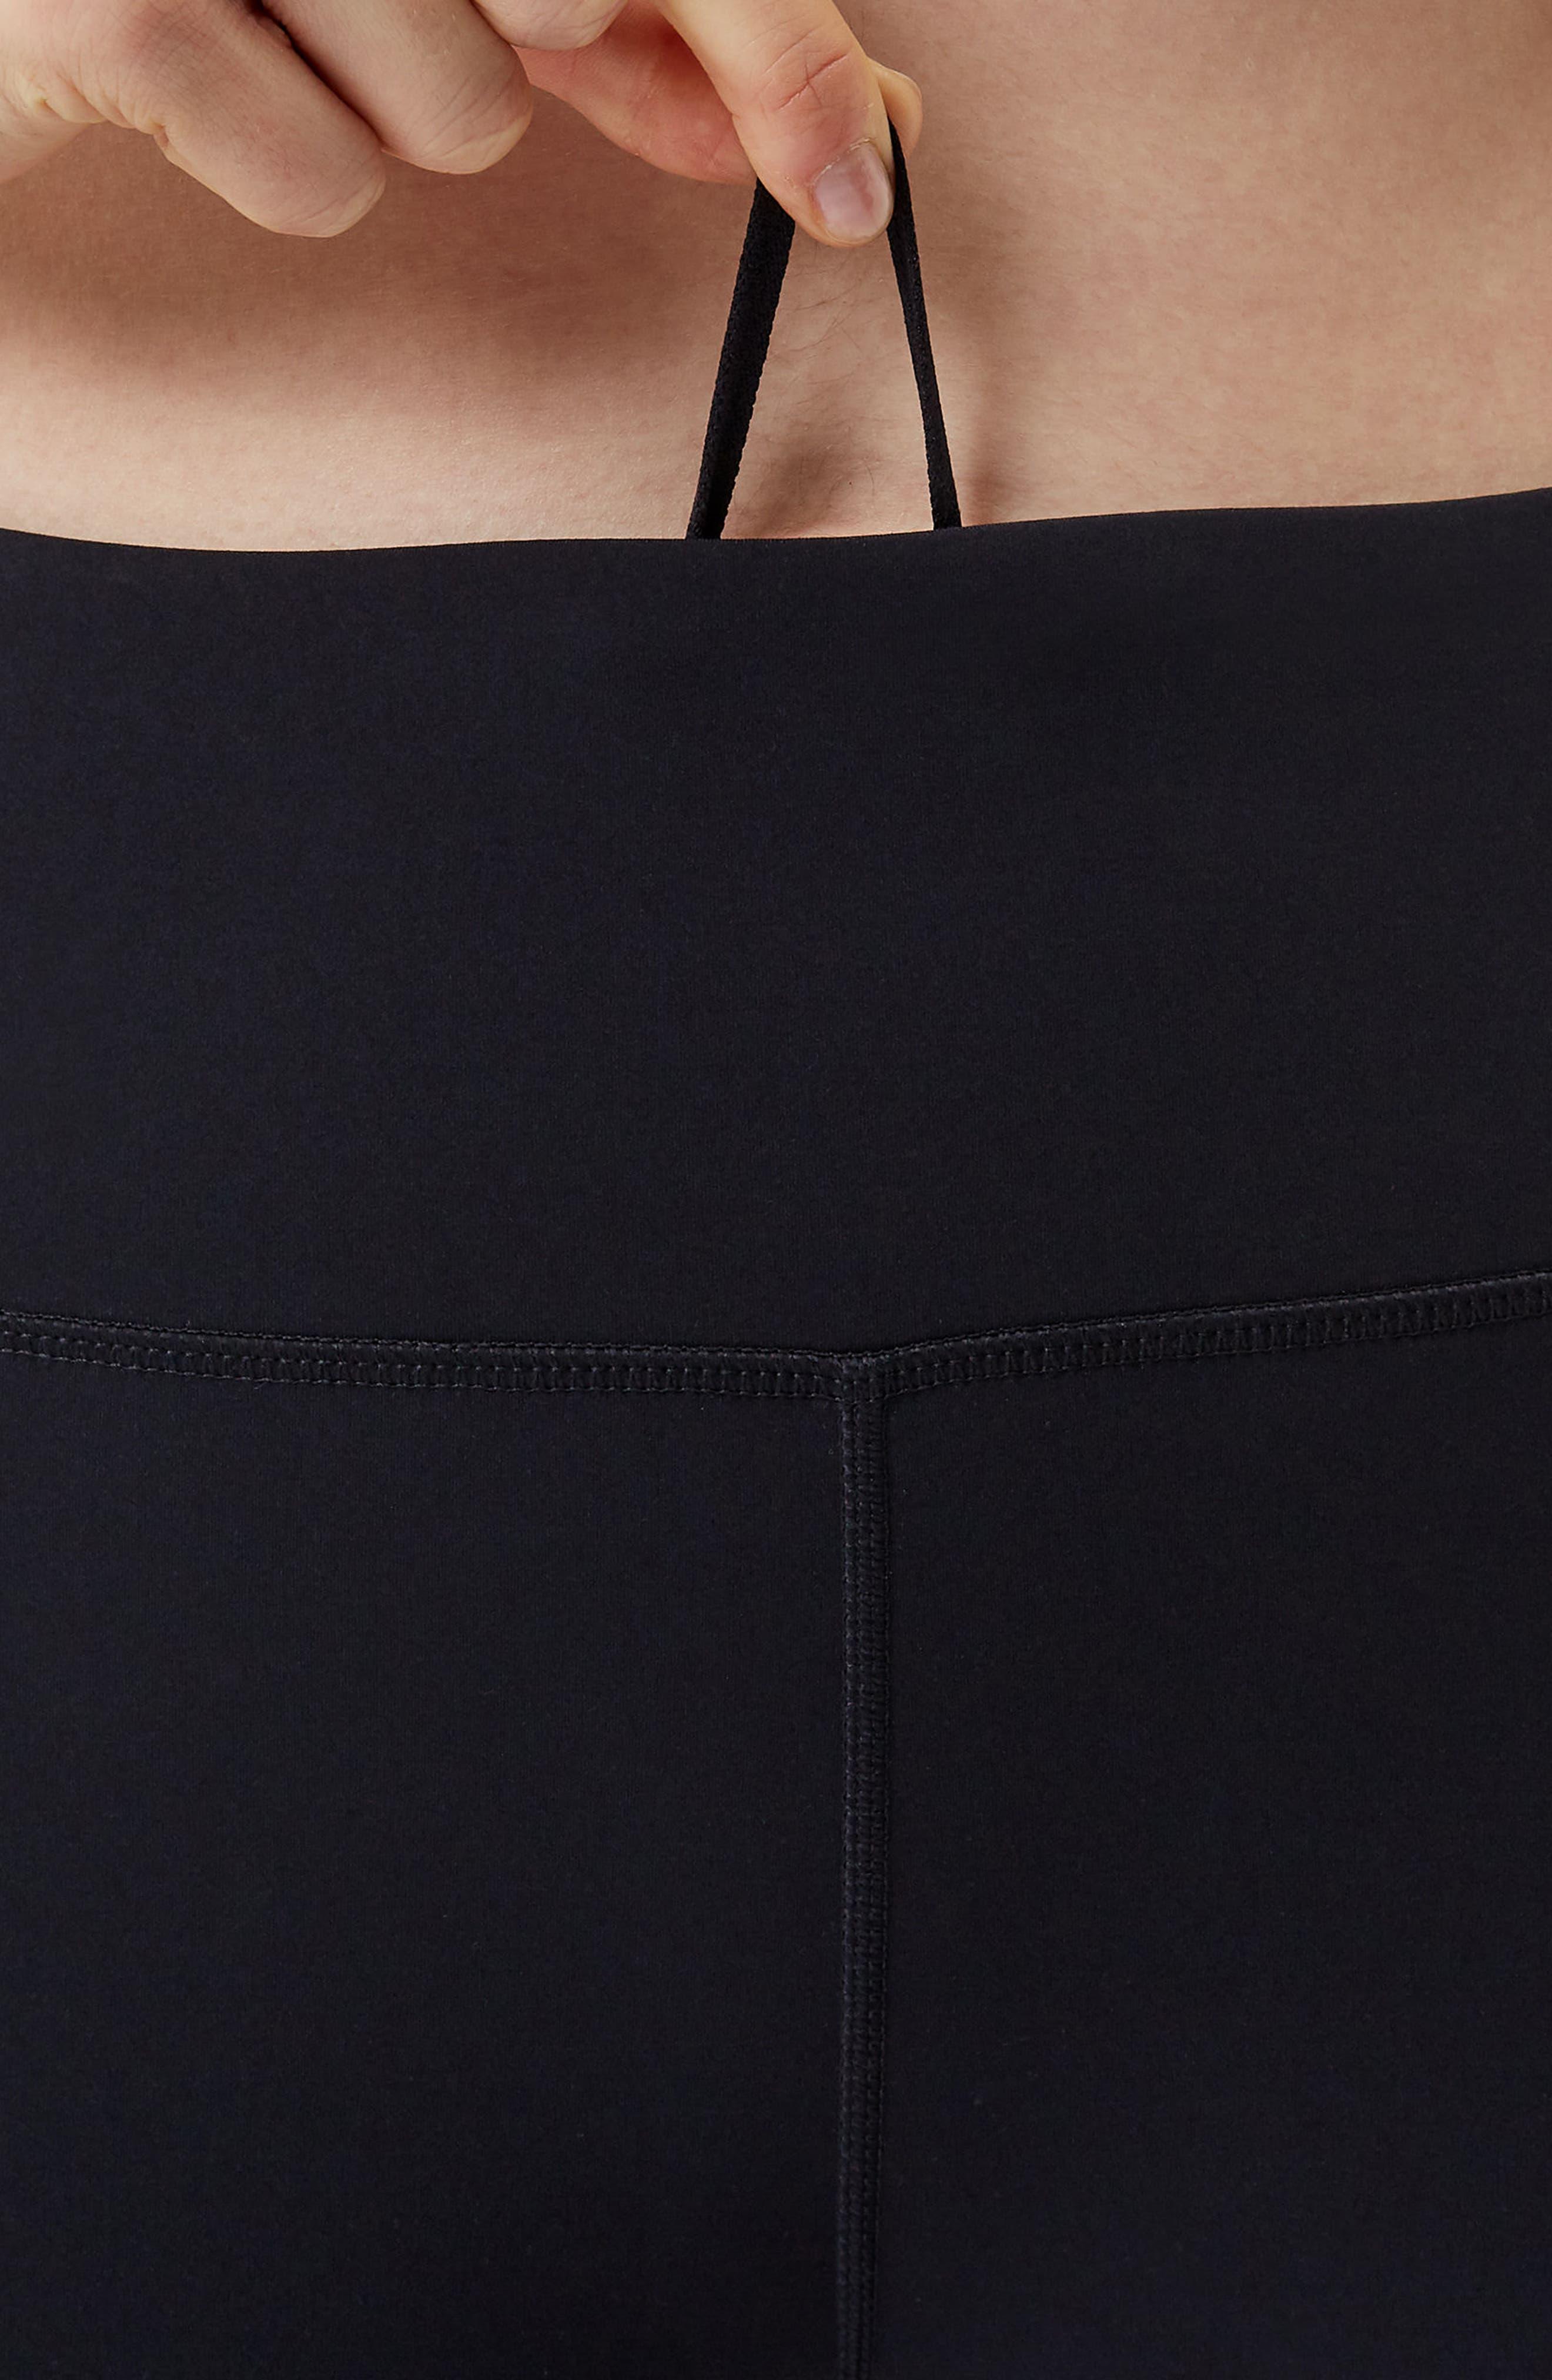 SWEATY BETTY, Power Workout Crop Leggings, Alternate thumbnail 7, color, BLACK